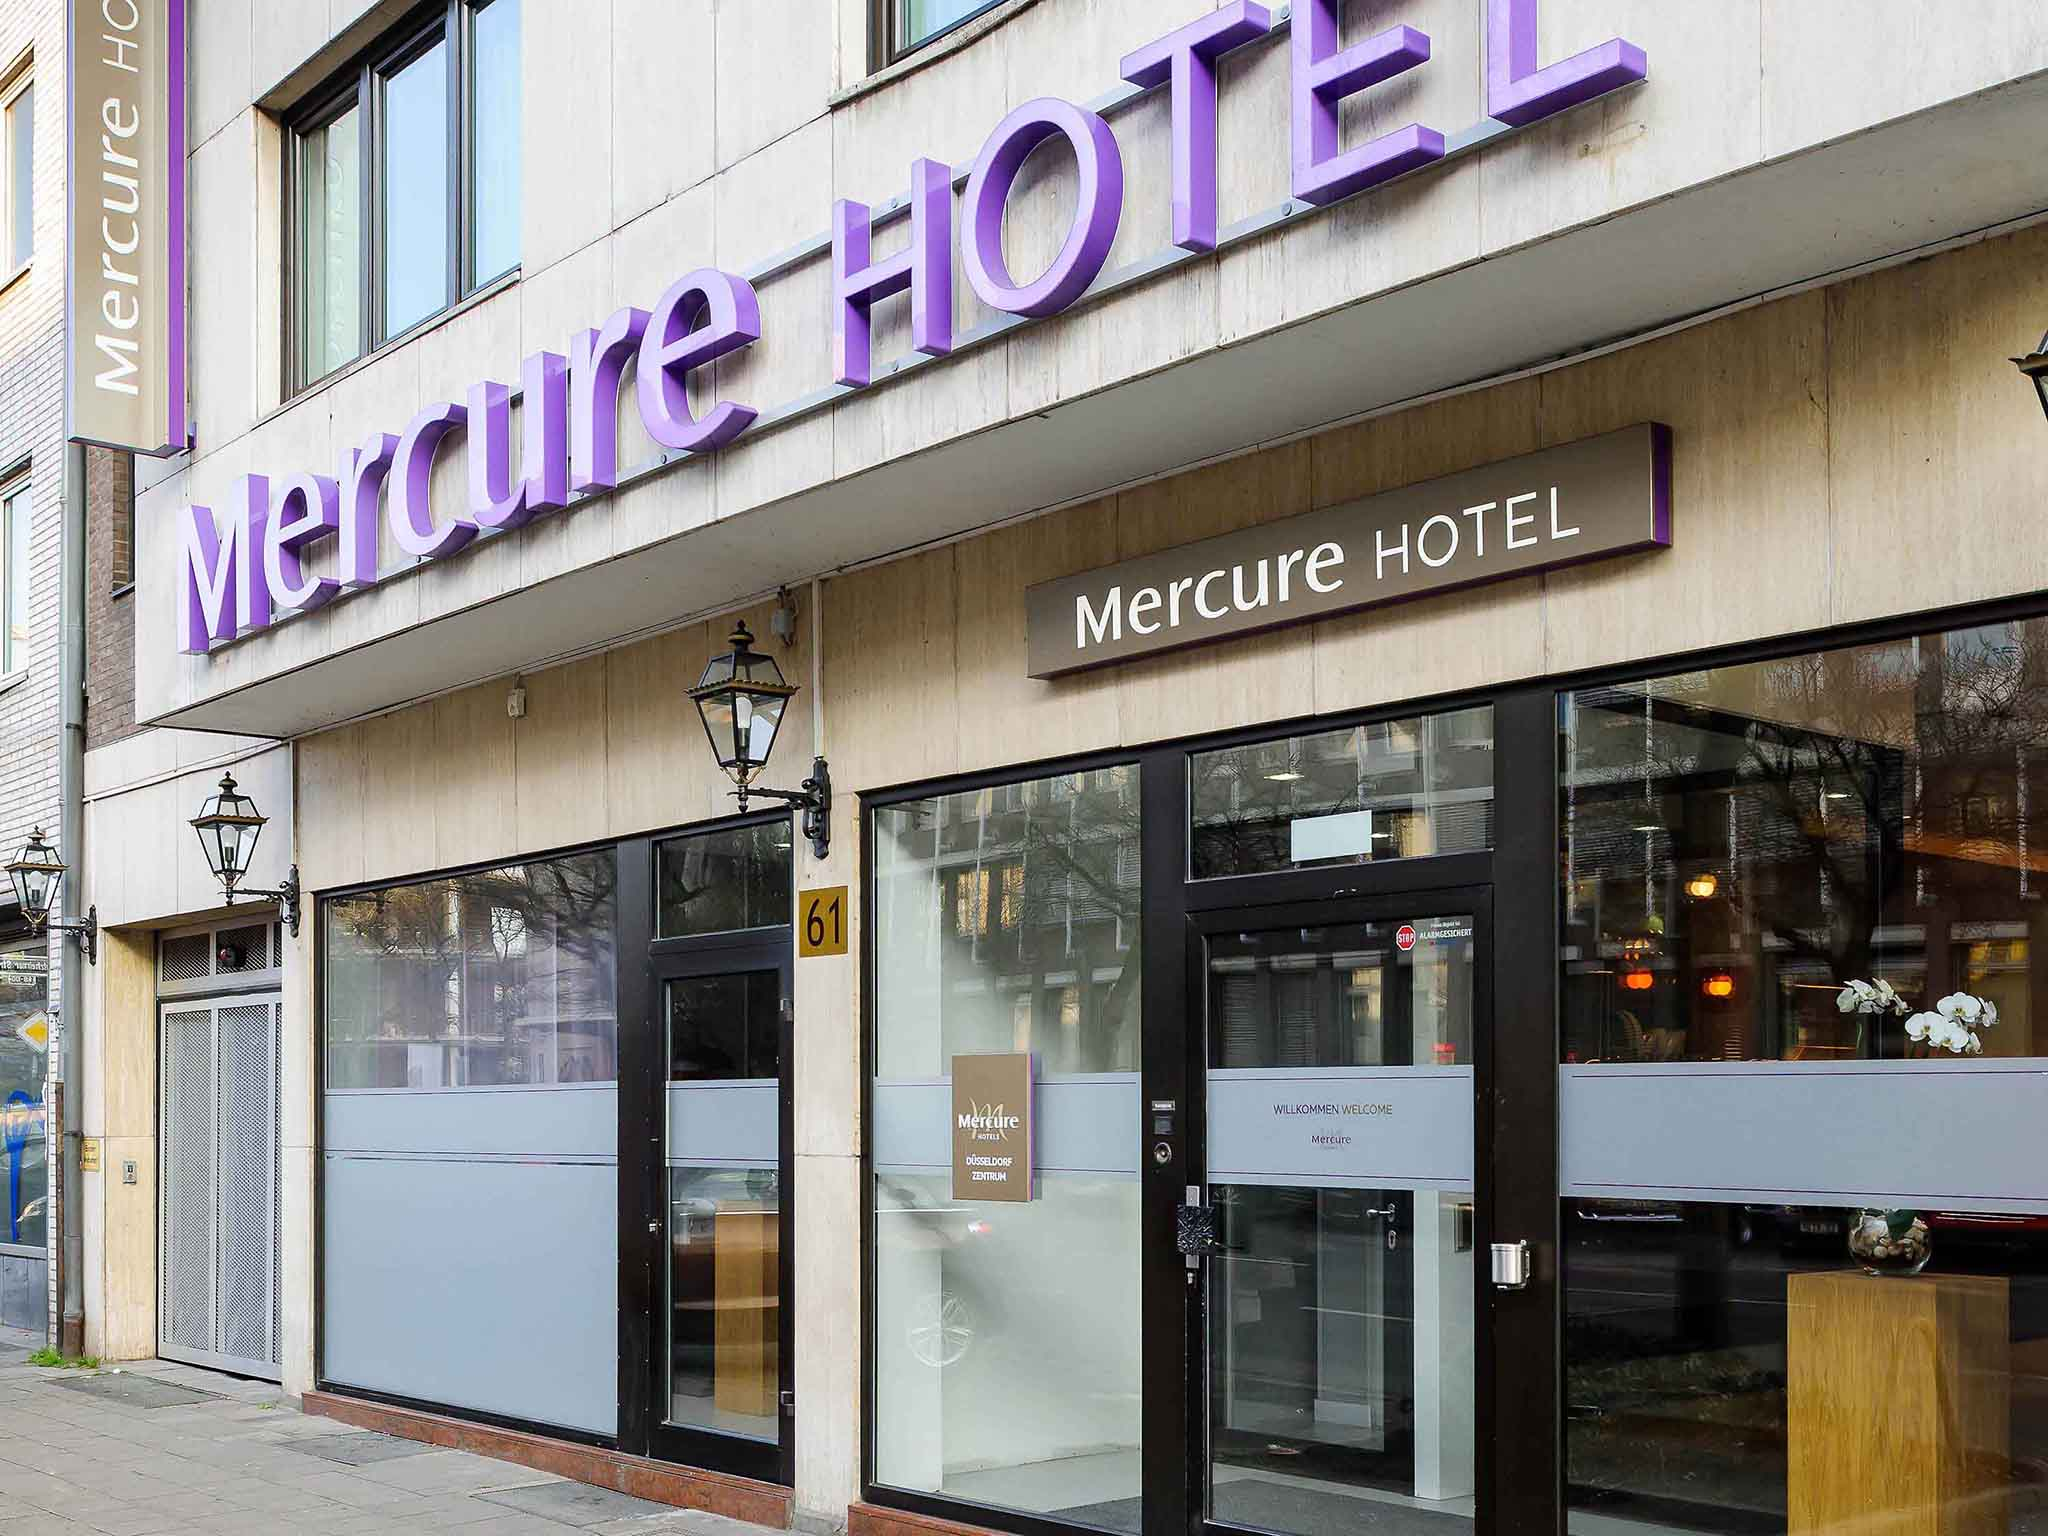 فندق - فندق Mercure دوسلدورف سنتروم